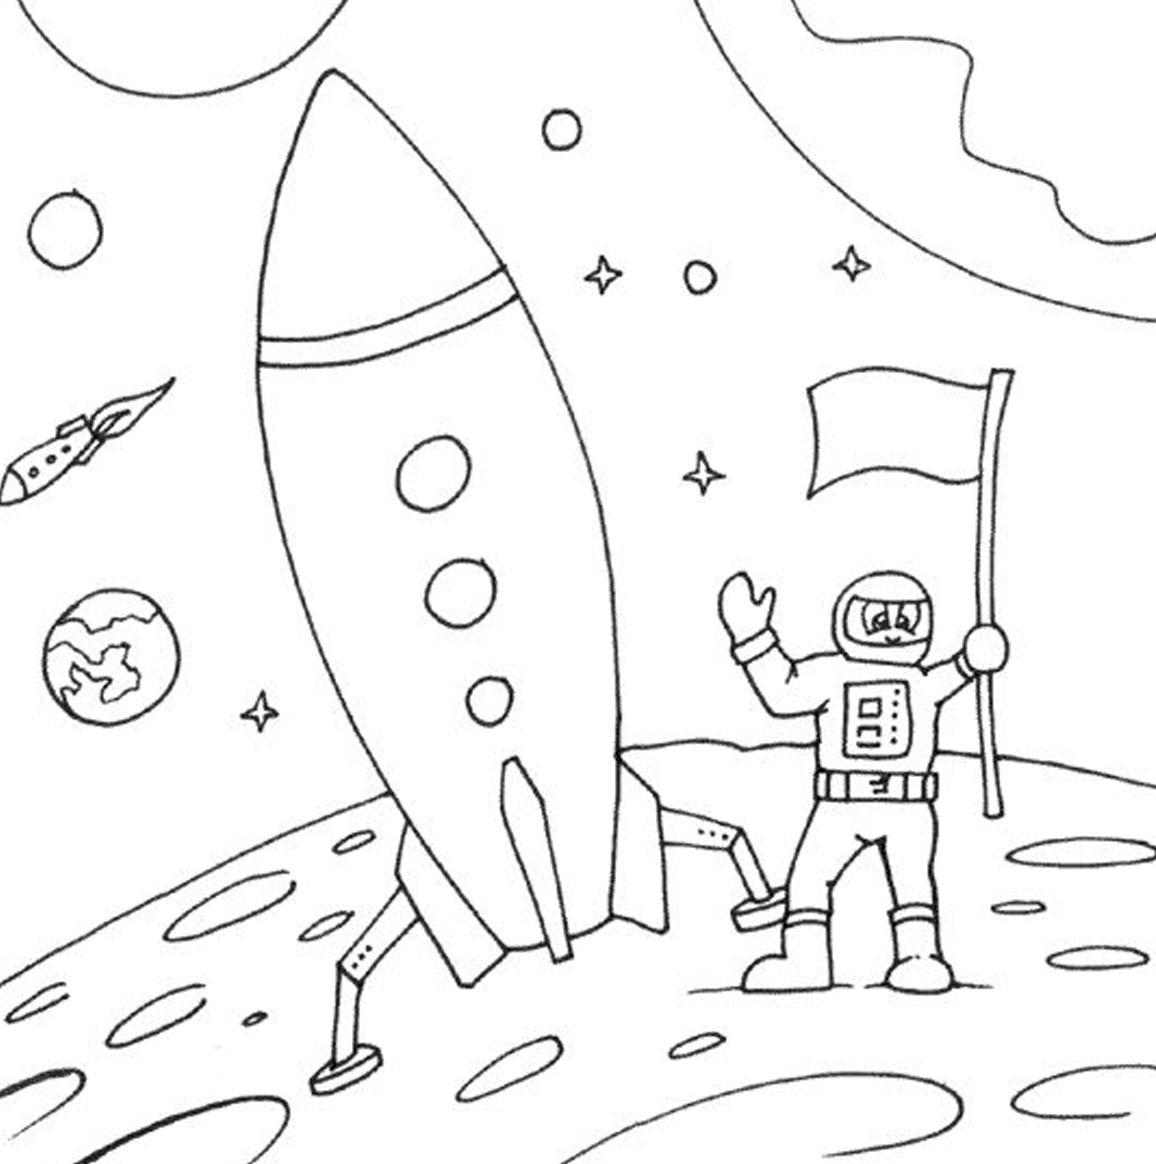 души желаю, картинка о космосе в карандаше качестве